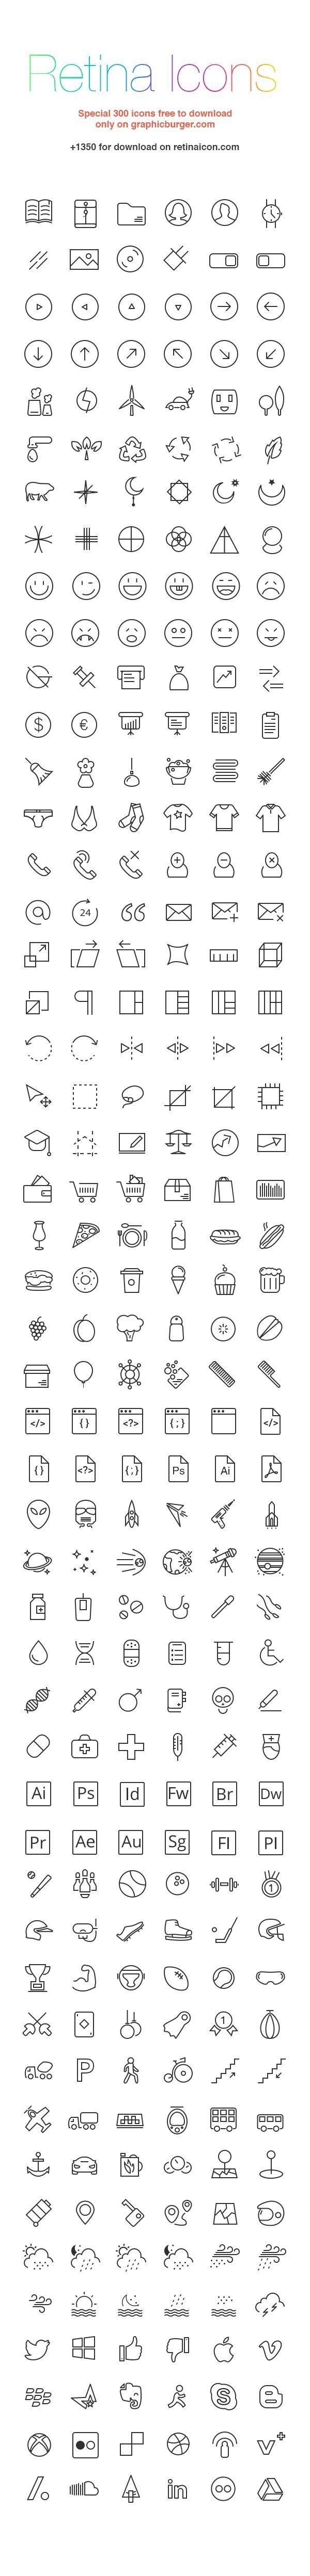 RetinaIcon: 300 Free Icons | GraphicBurger by Katybug